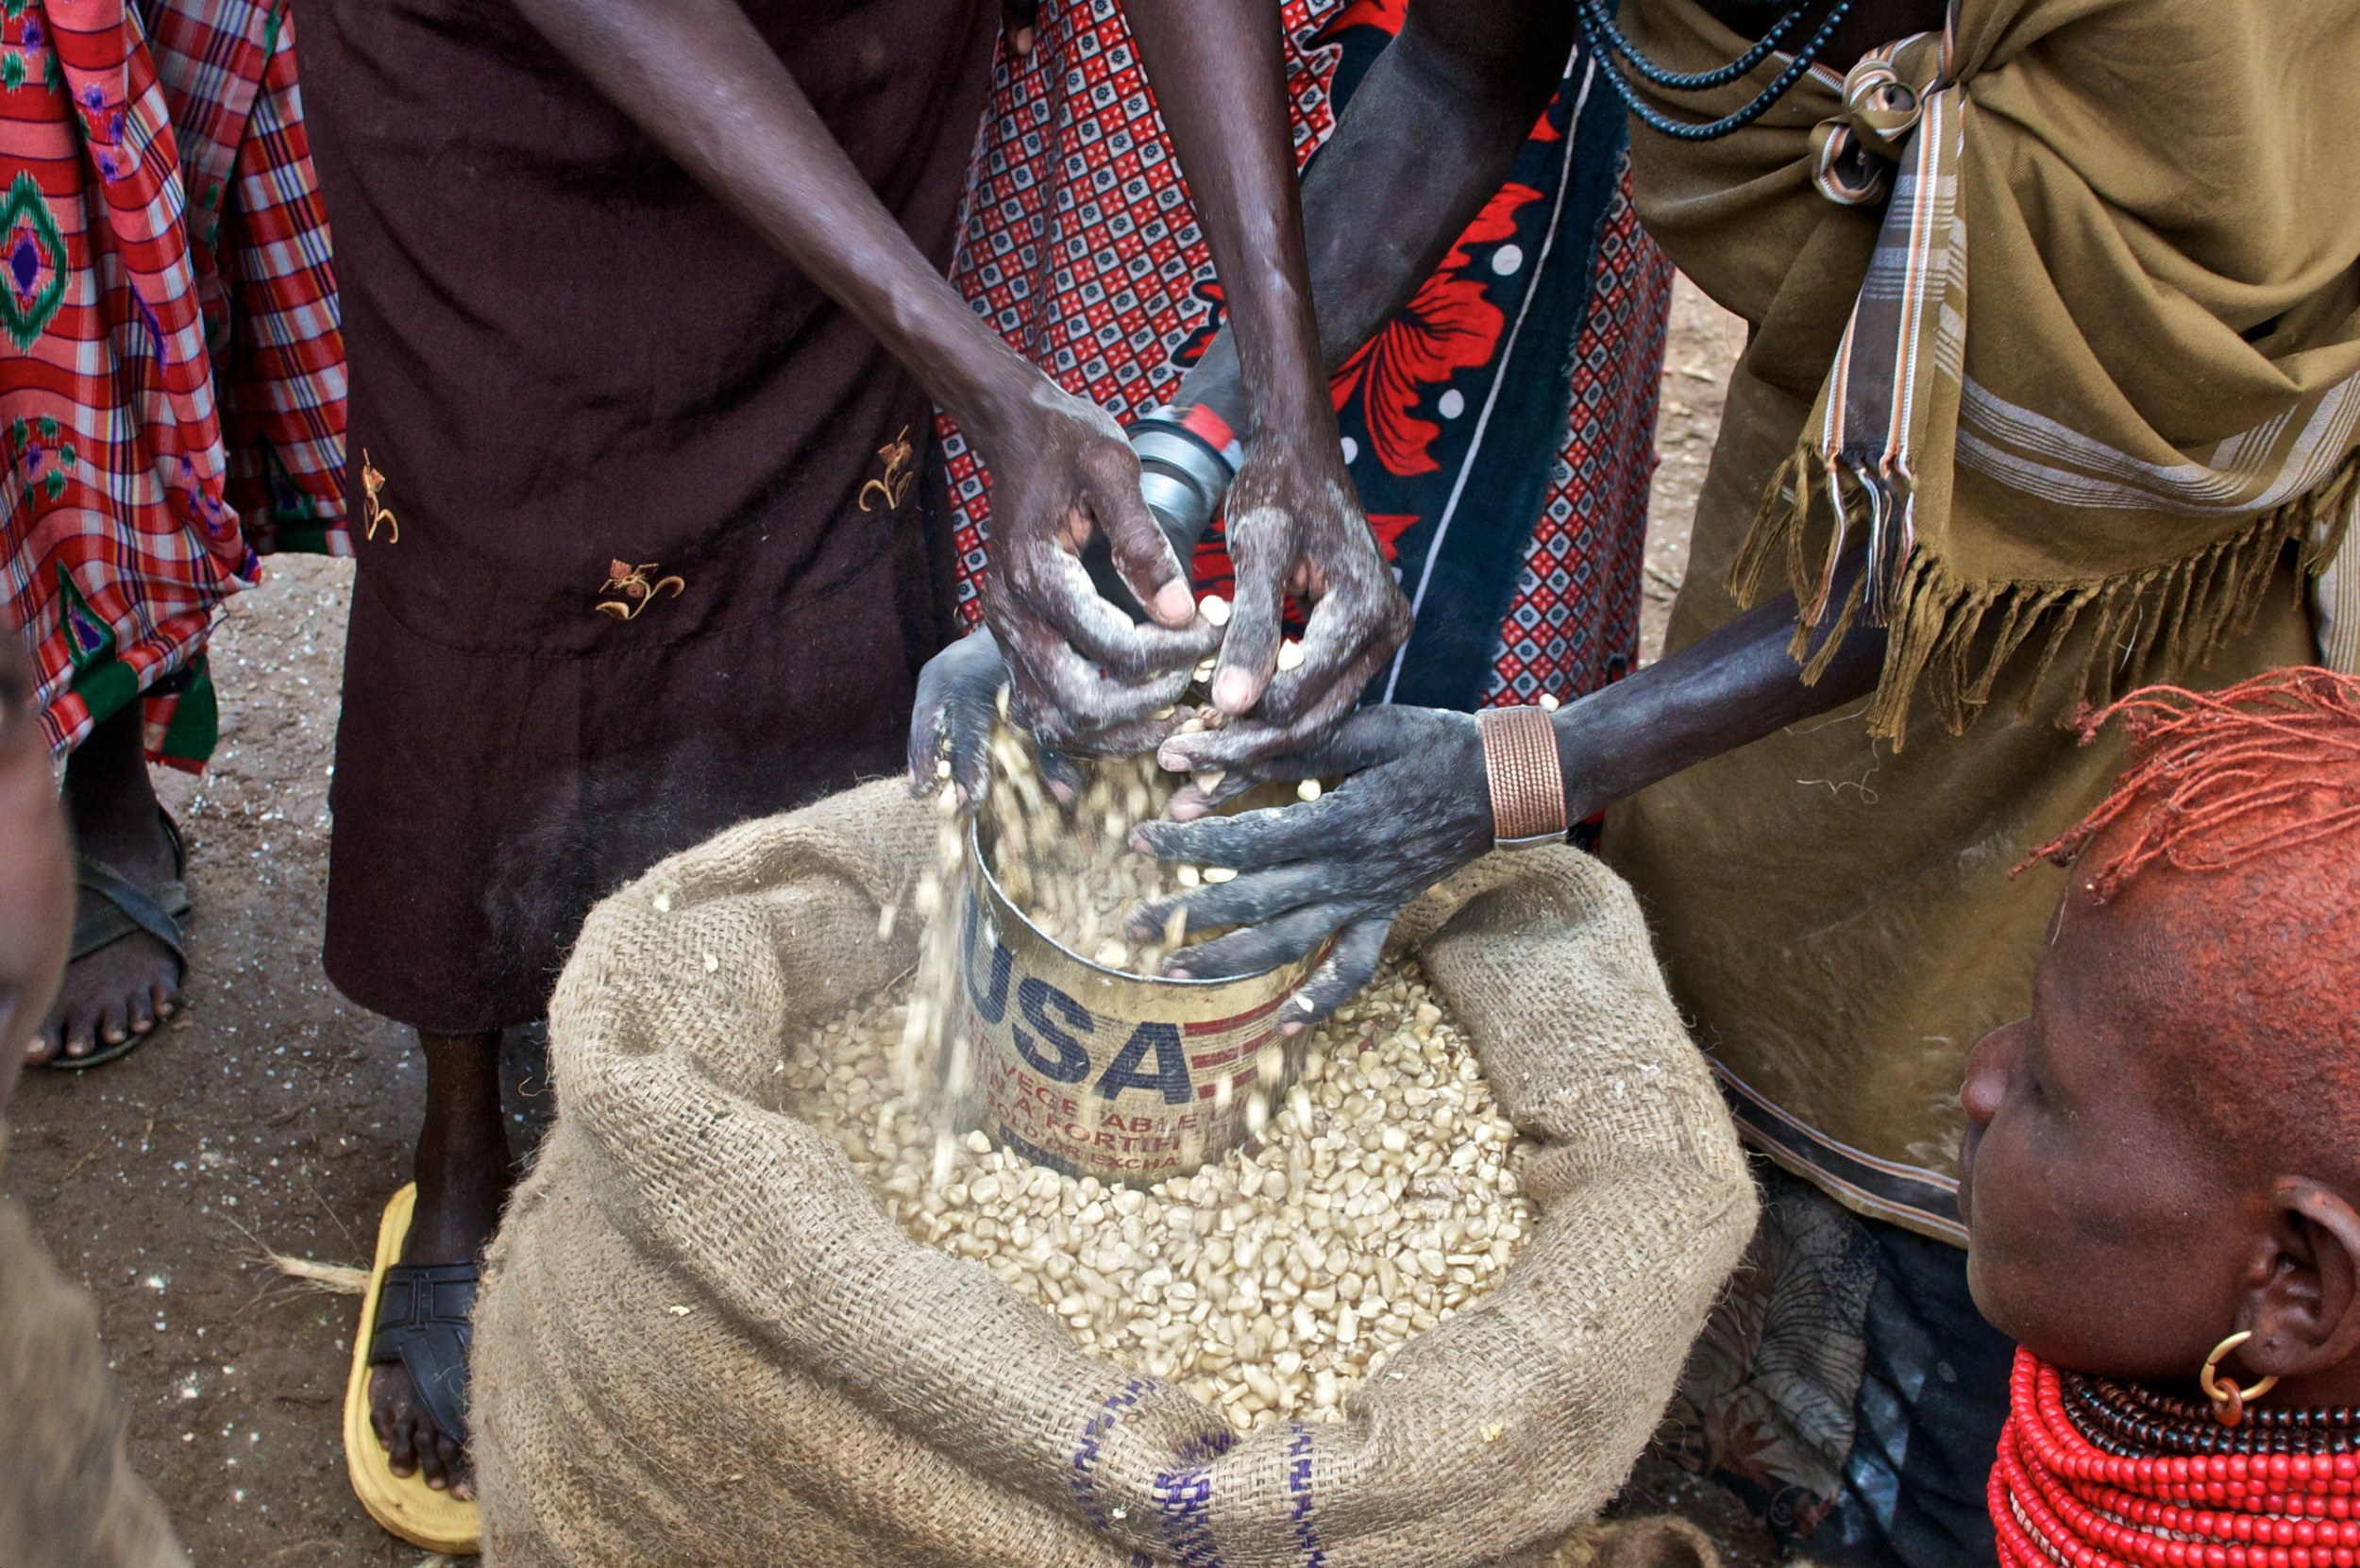 AE_Turkana_0911_0003.jpg